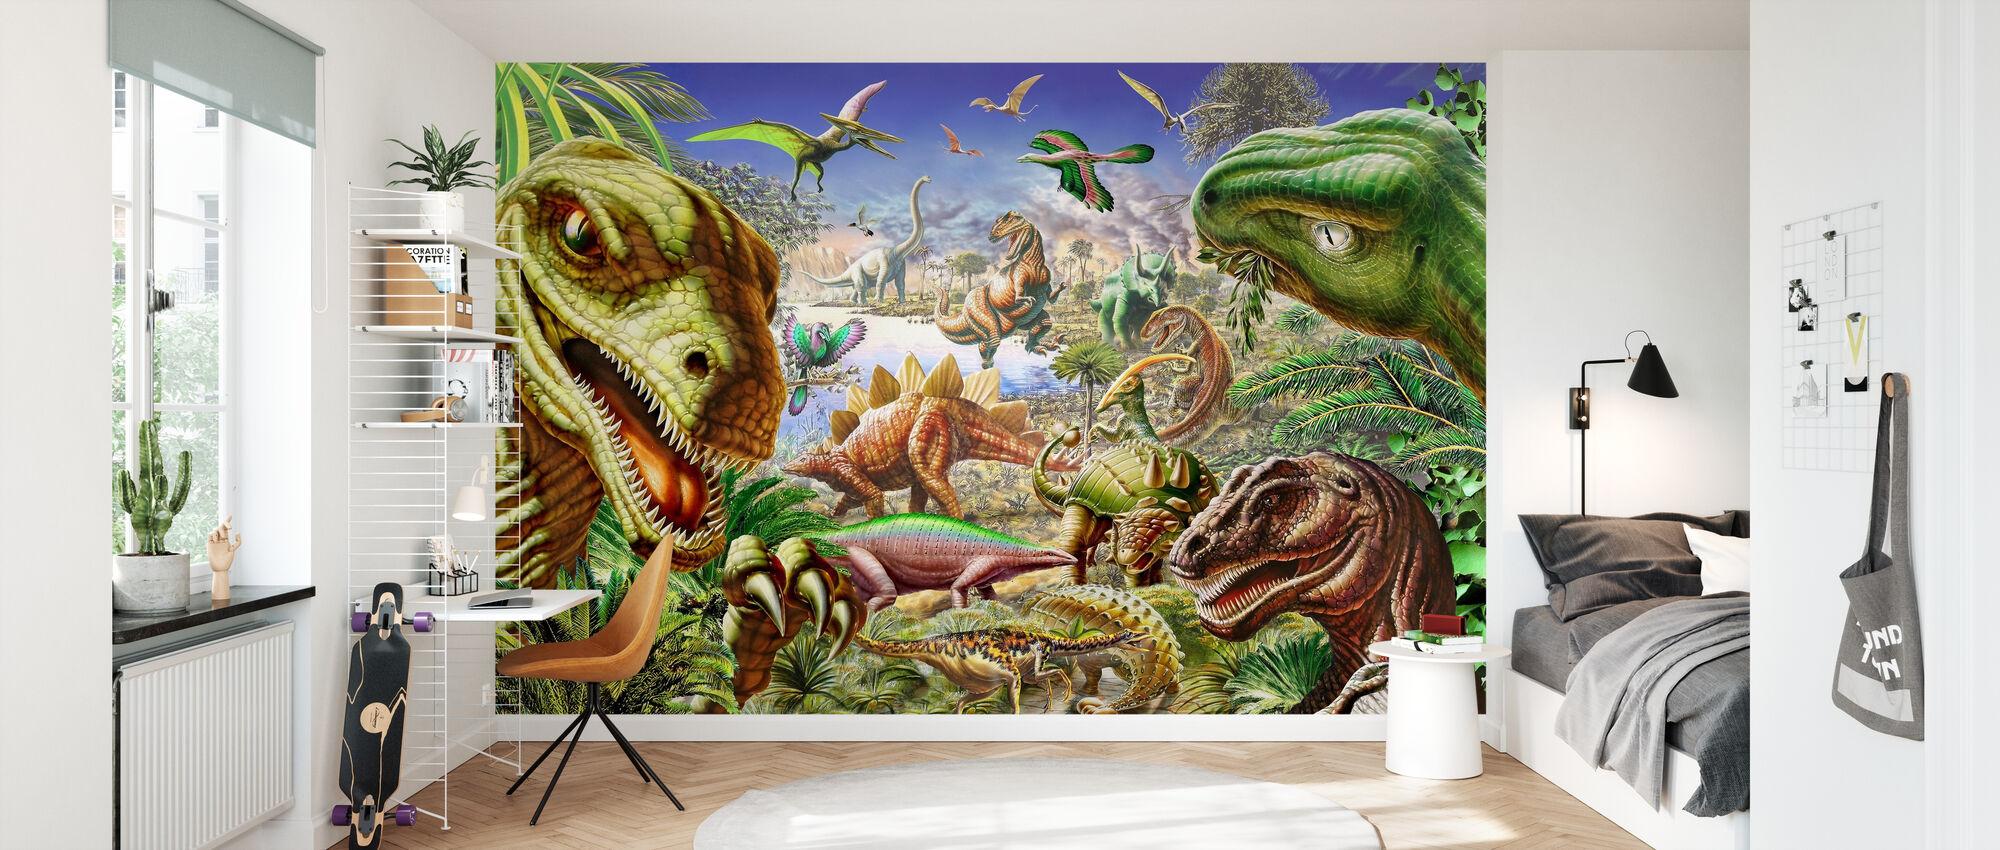 Dinosaur_s World 2 - Wallpaper - Kids Room